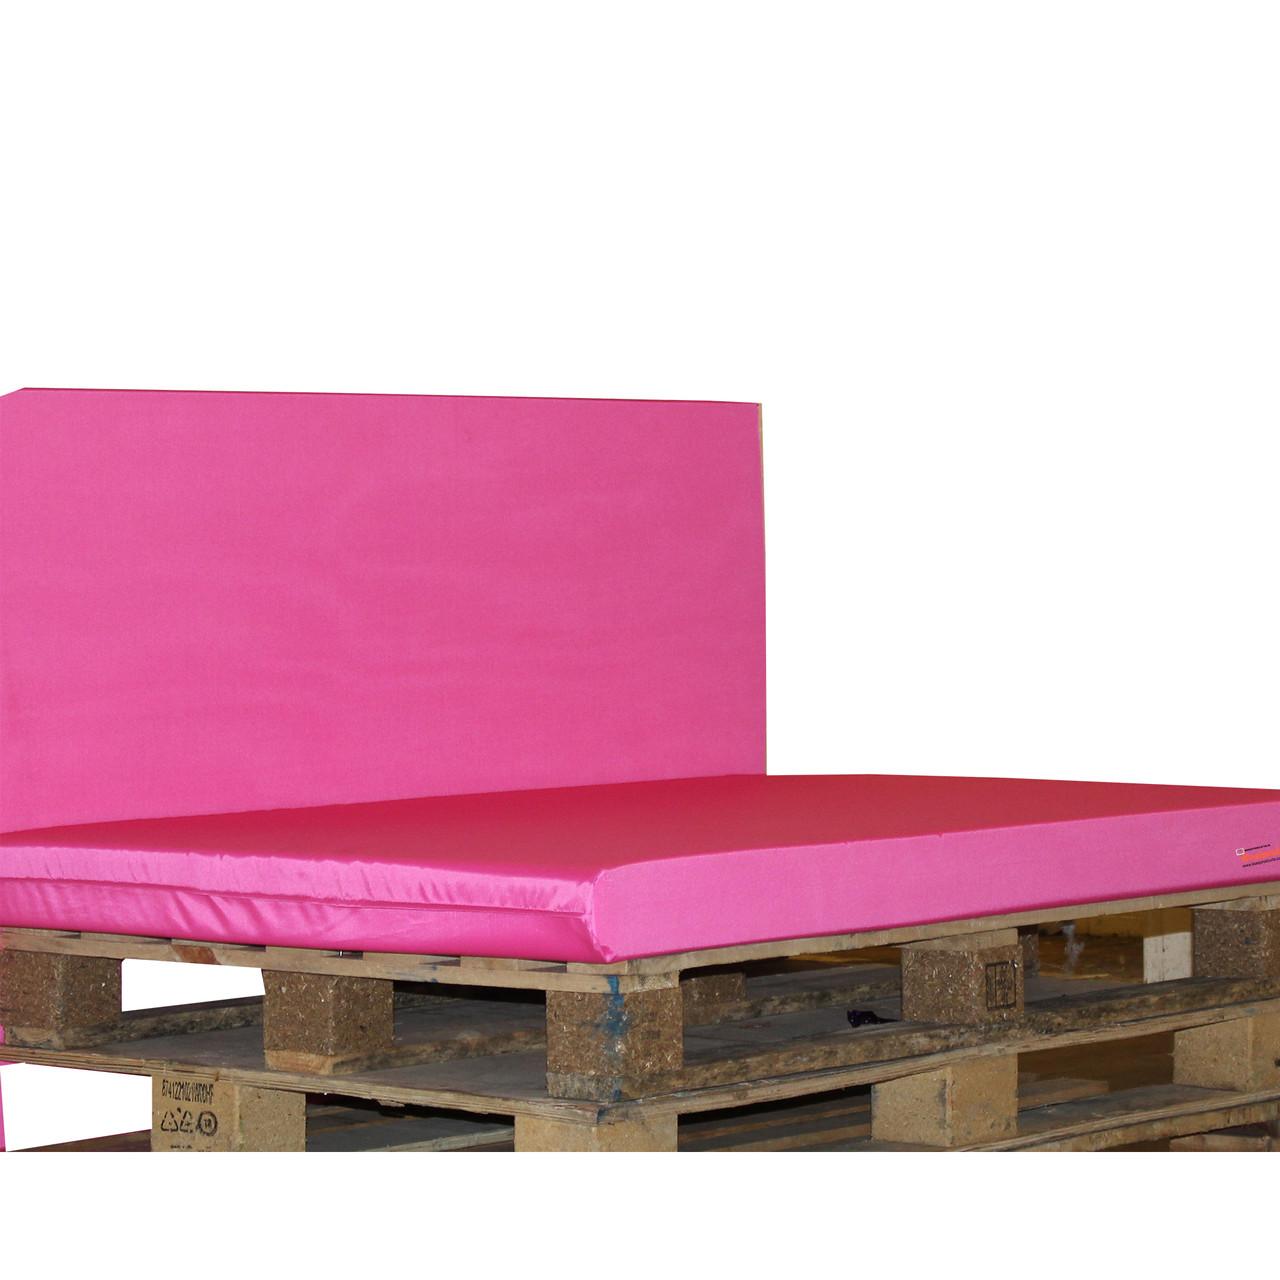 Kosipad Pink foam cushion pads seating Cushions for Euro Pallets